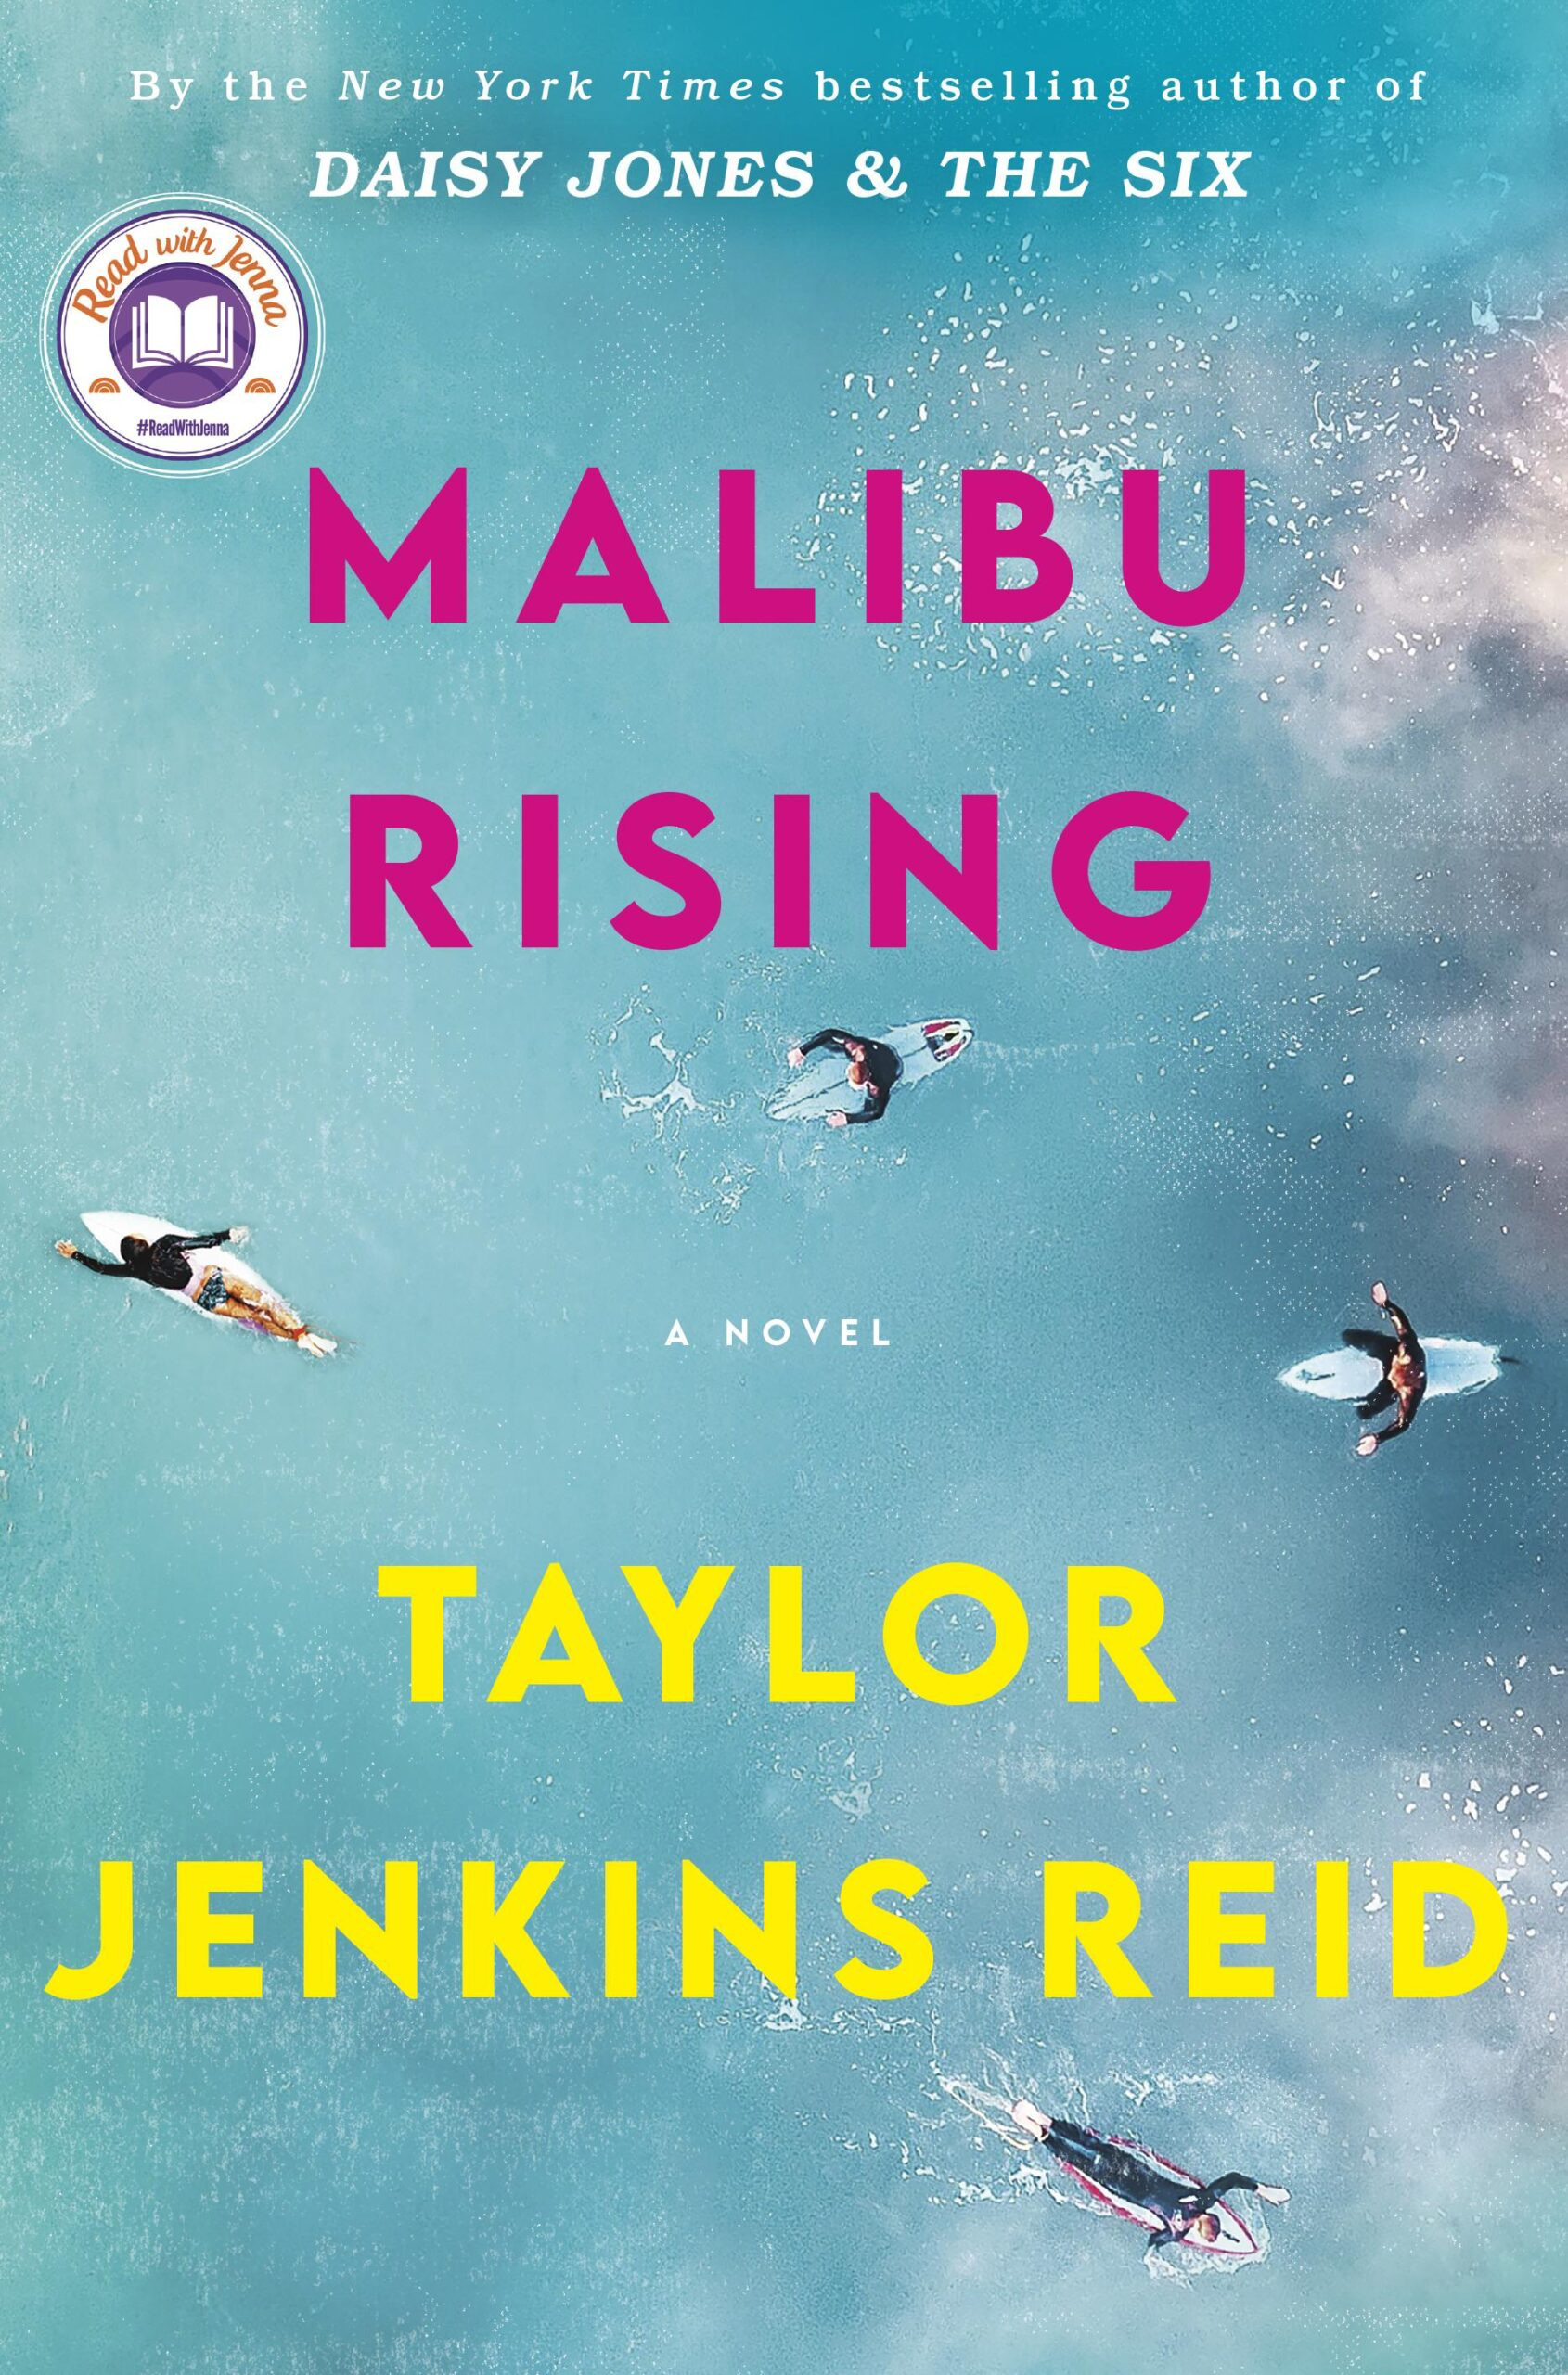 Malibu Rising by Taylor Jenkins Reid book